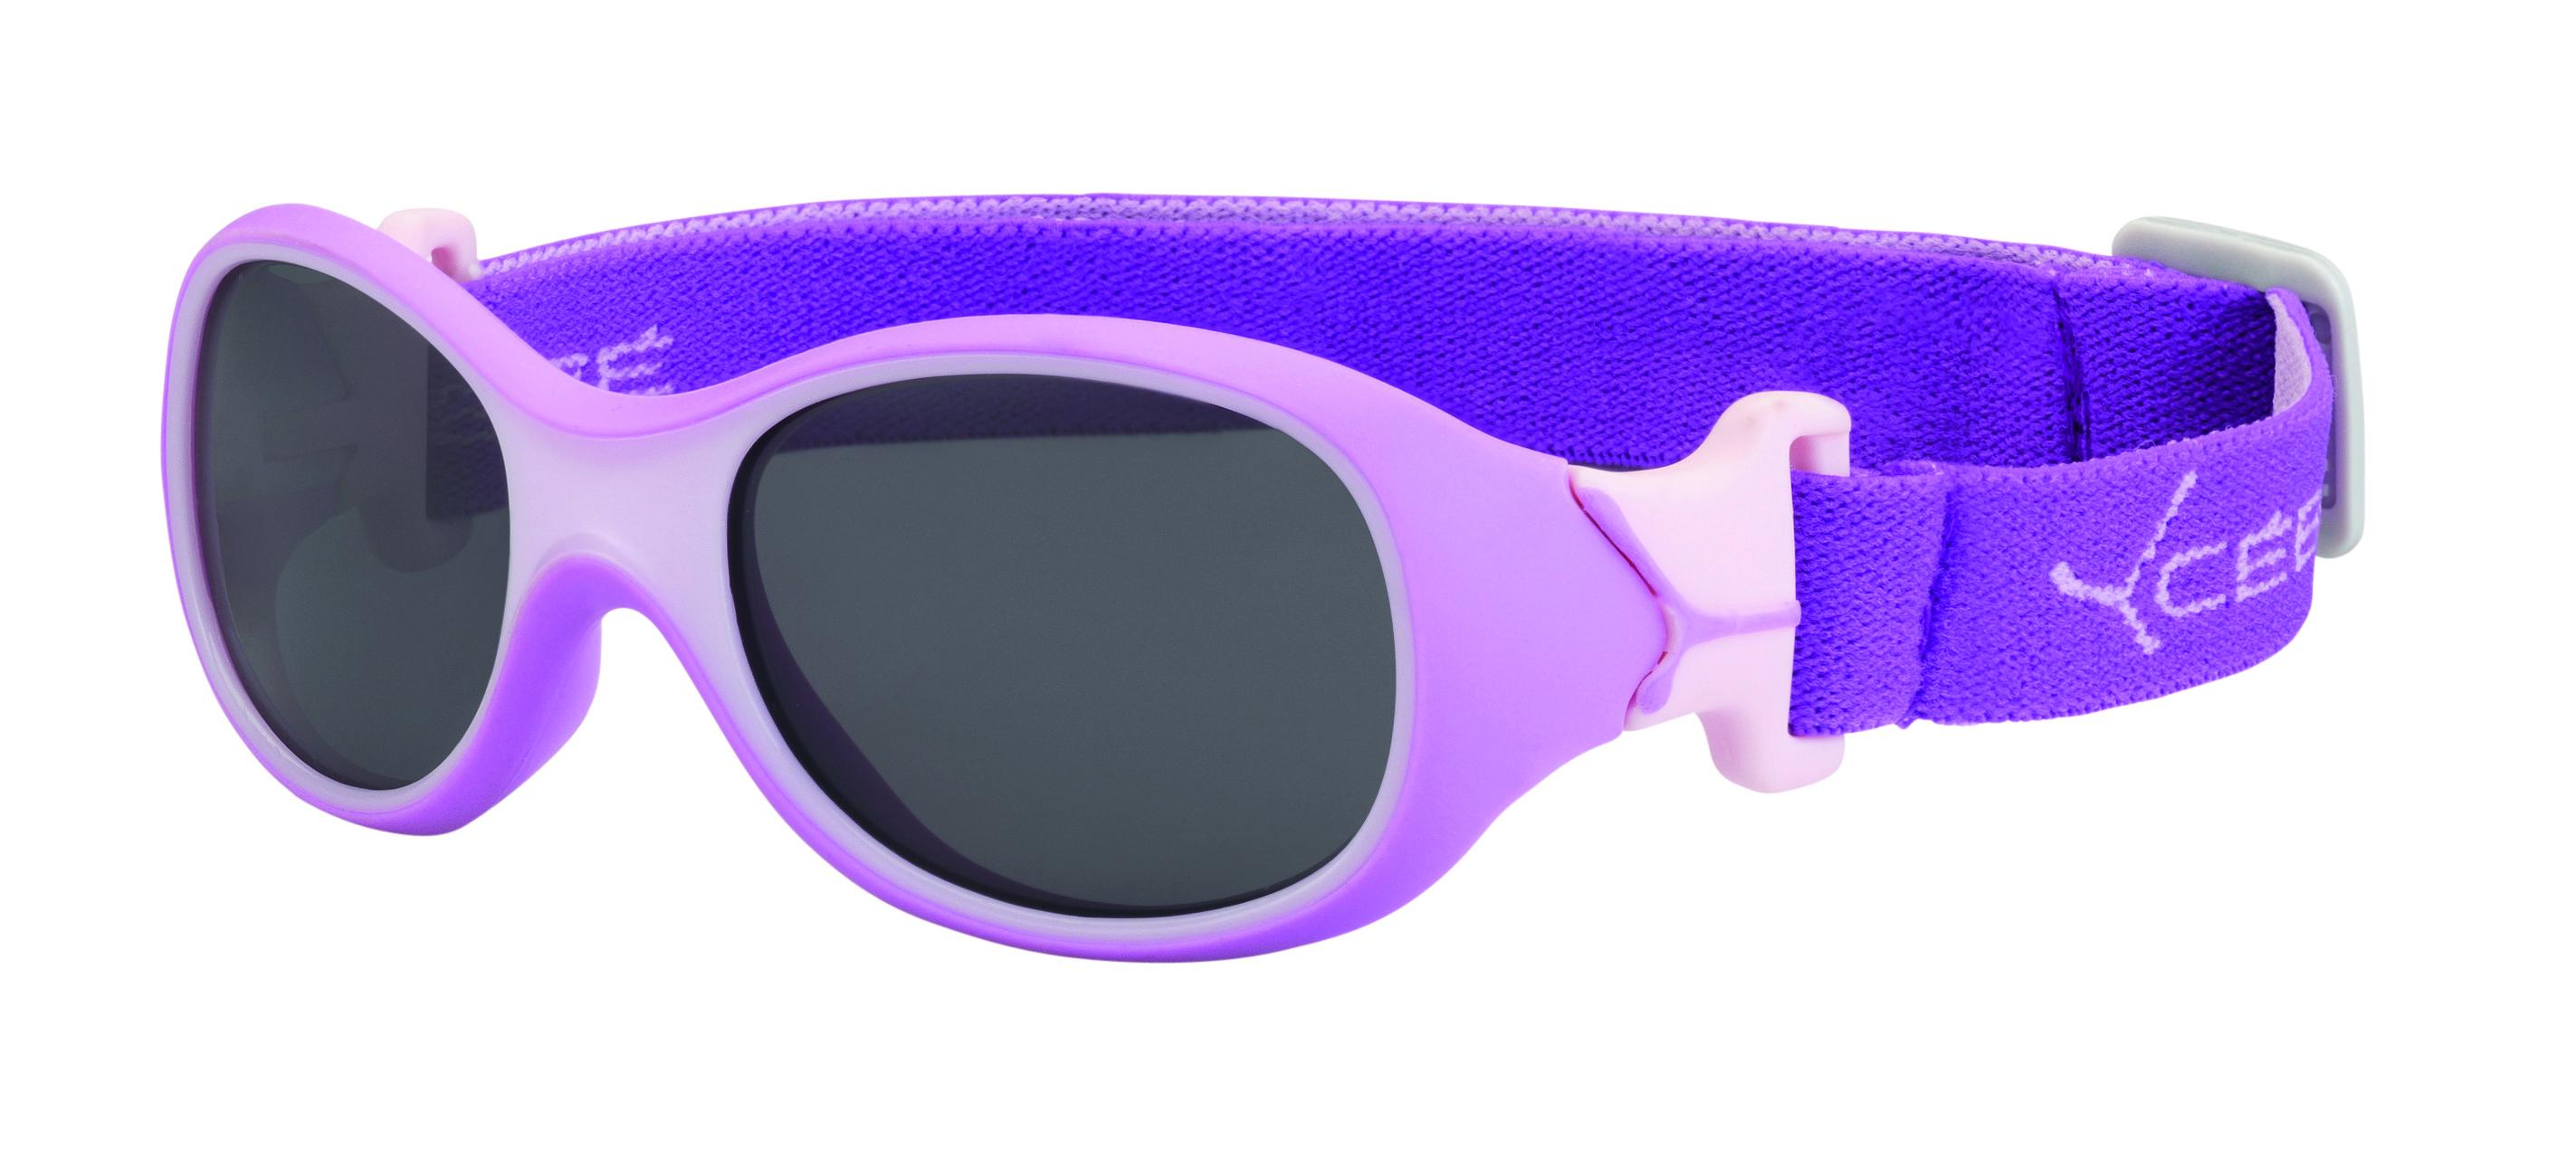 Verstellbare Kinder-Sportbrille